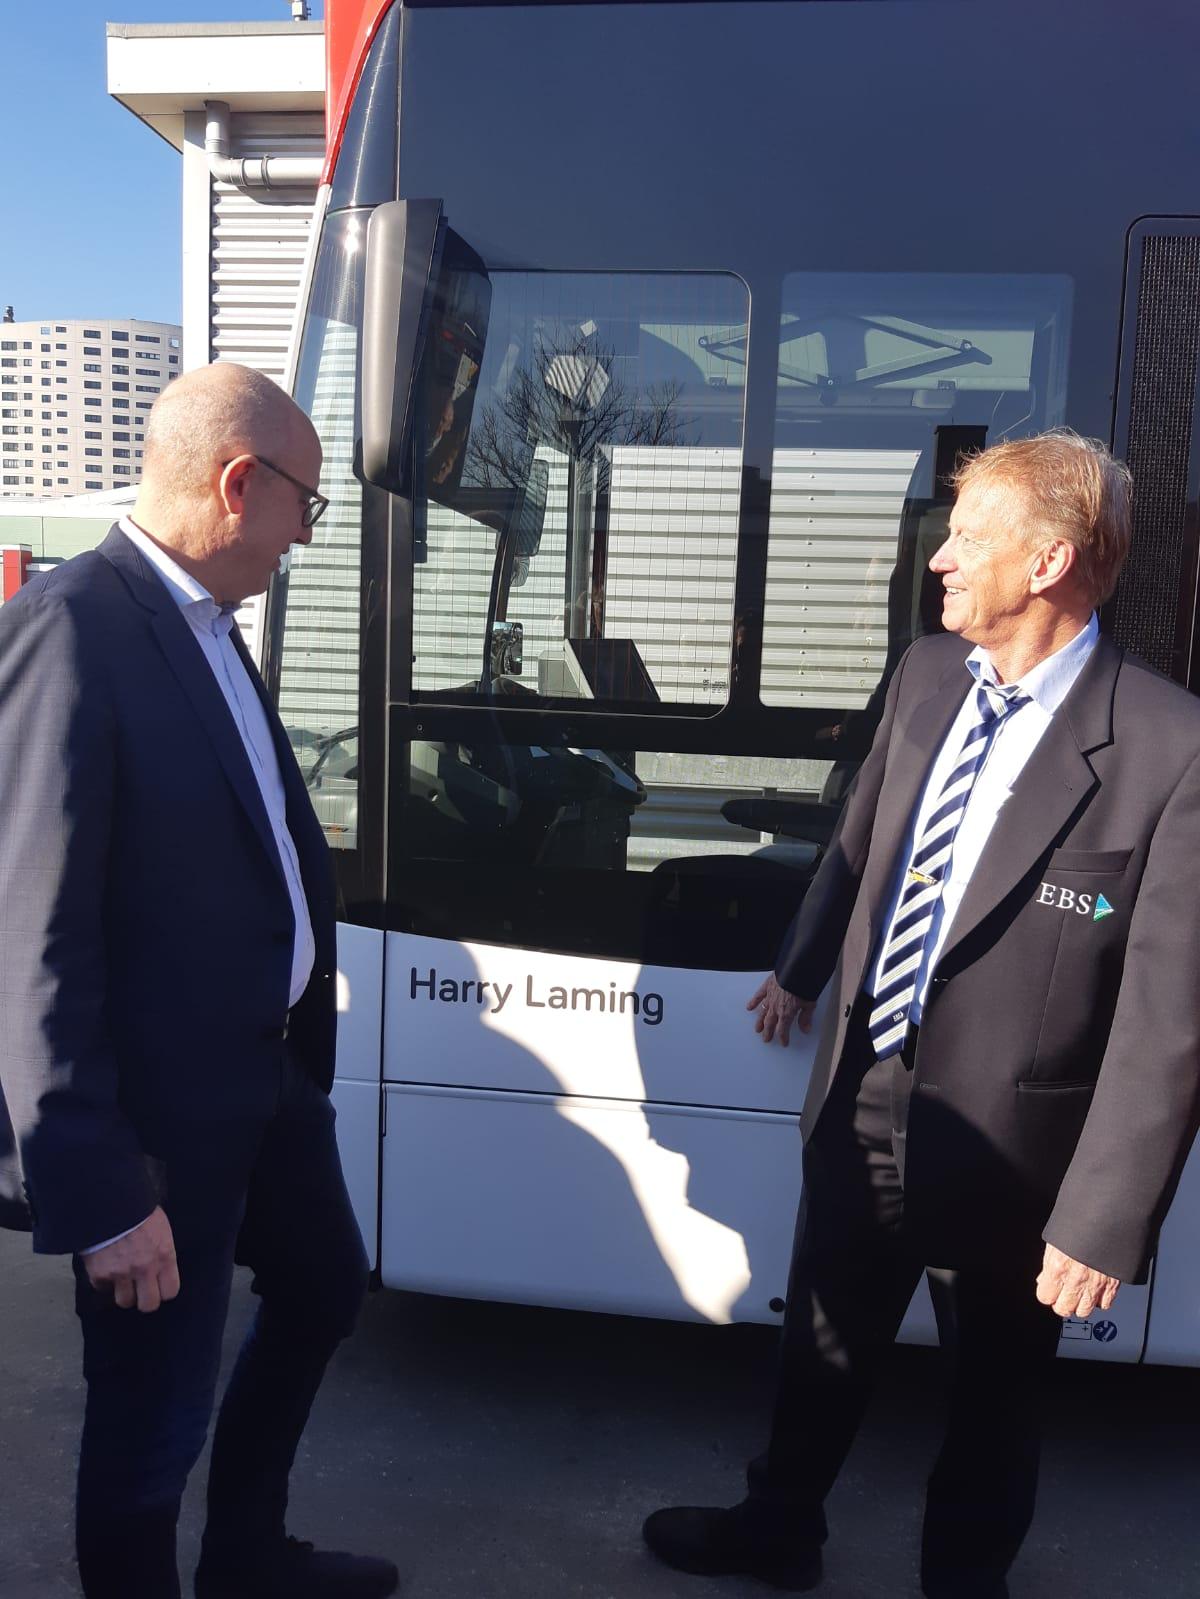 HarryLaming_bus01